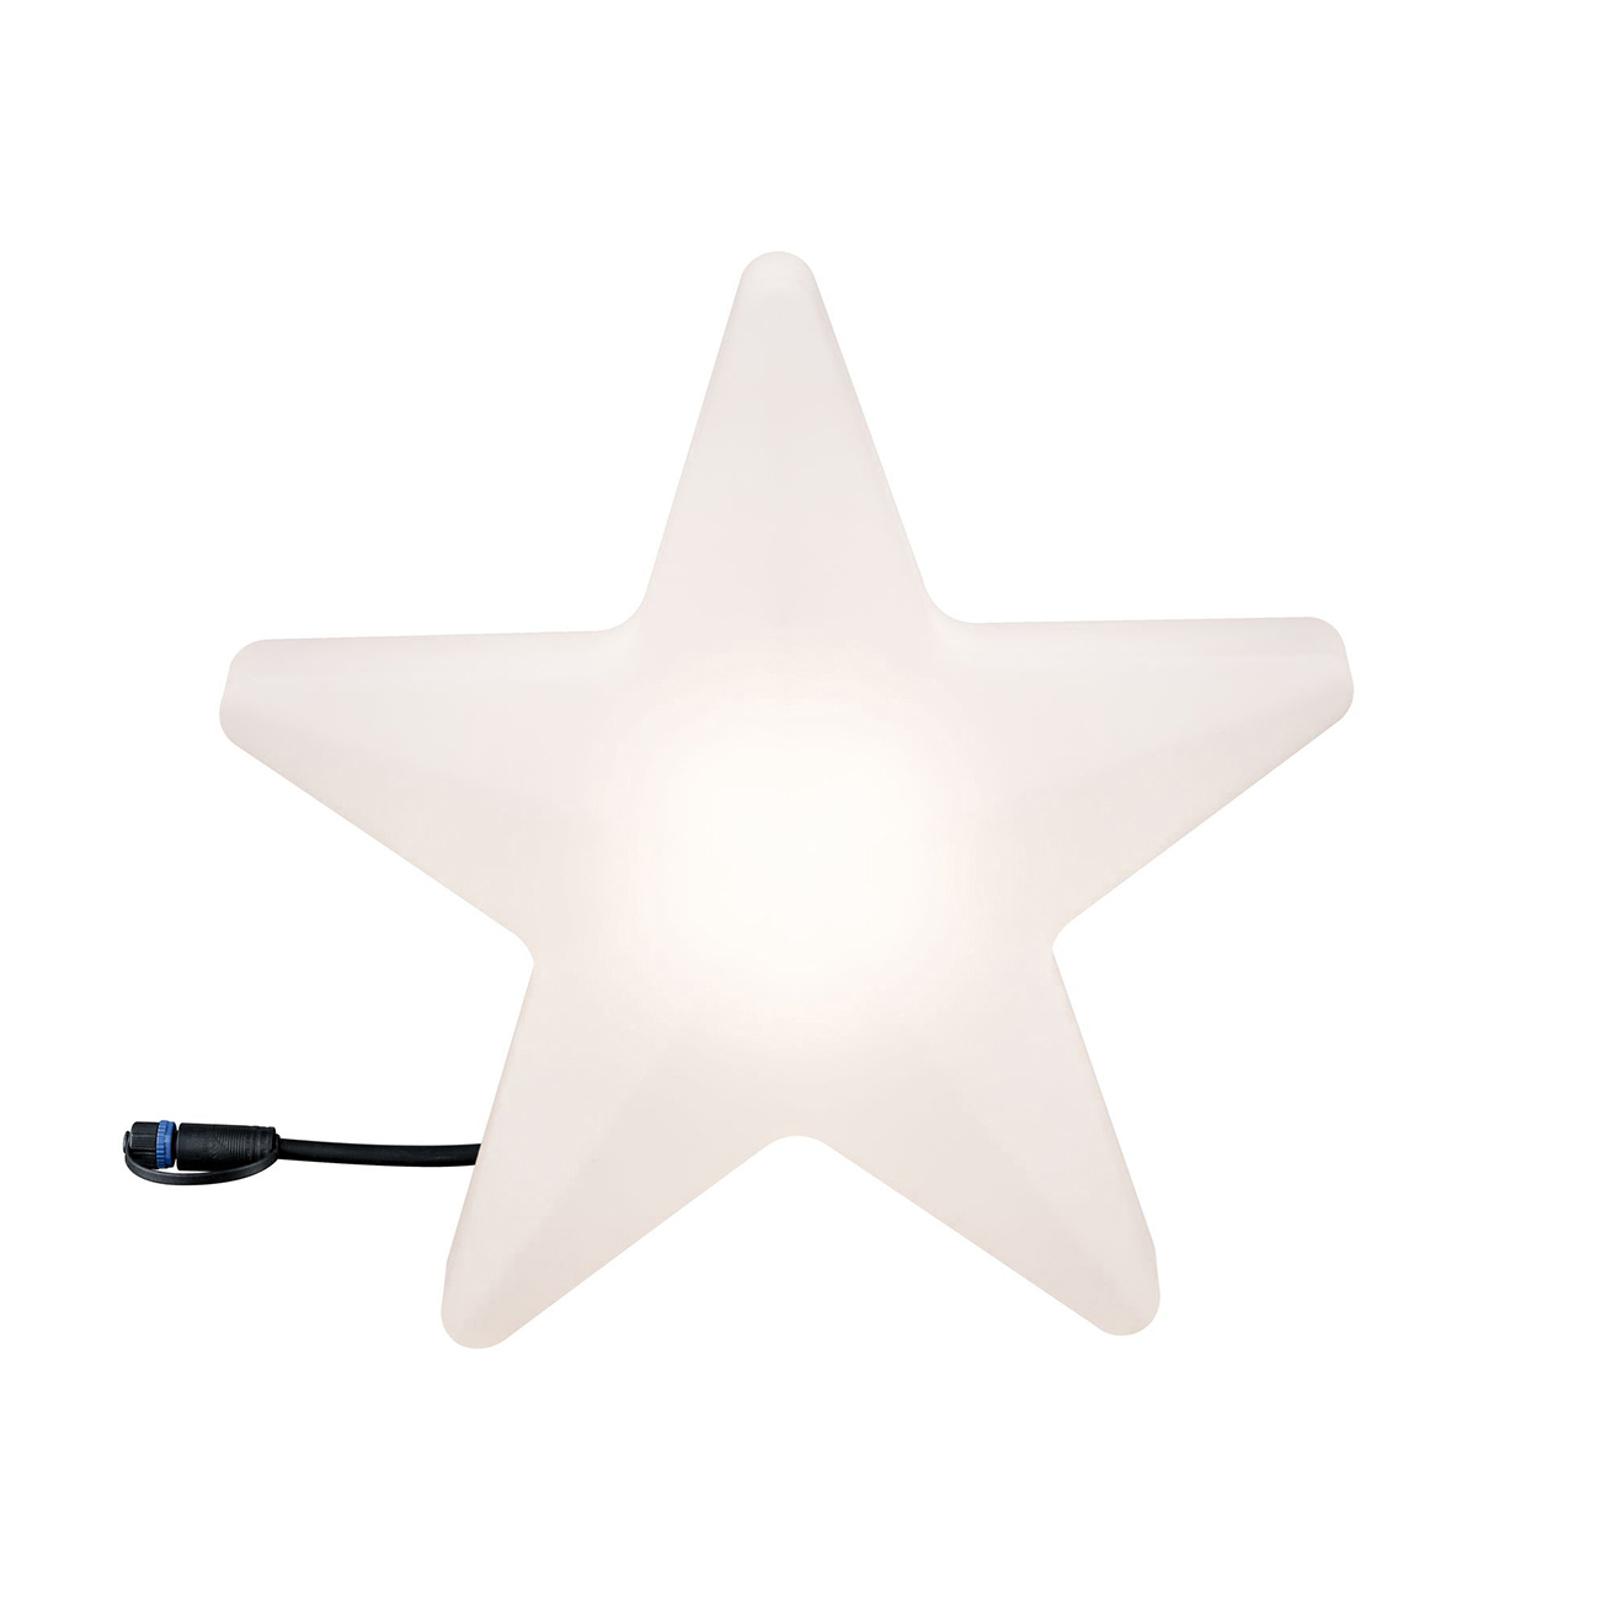 Paulmann Plug & Shine lampe déco LED Star Ø 40cm